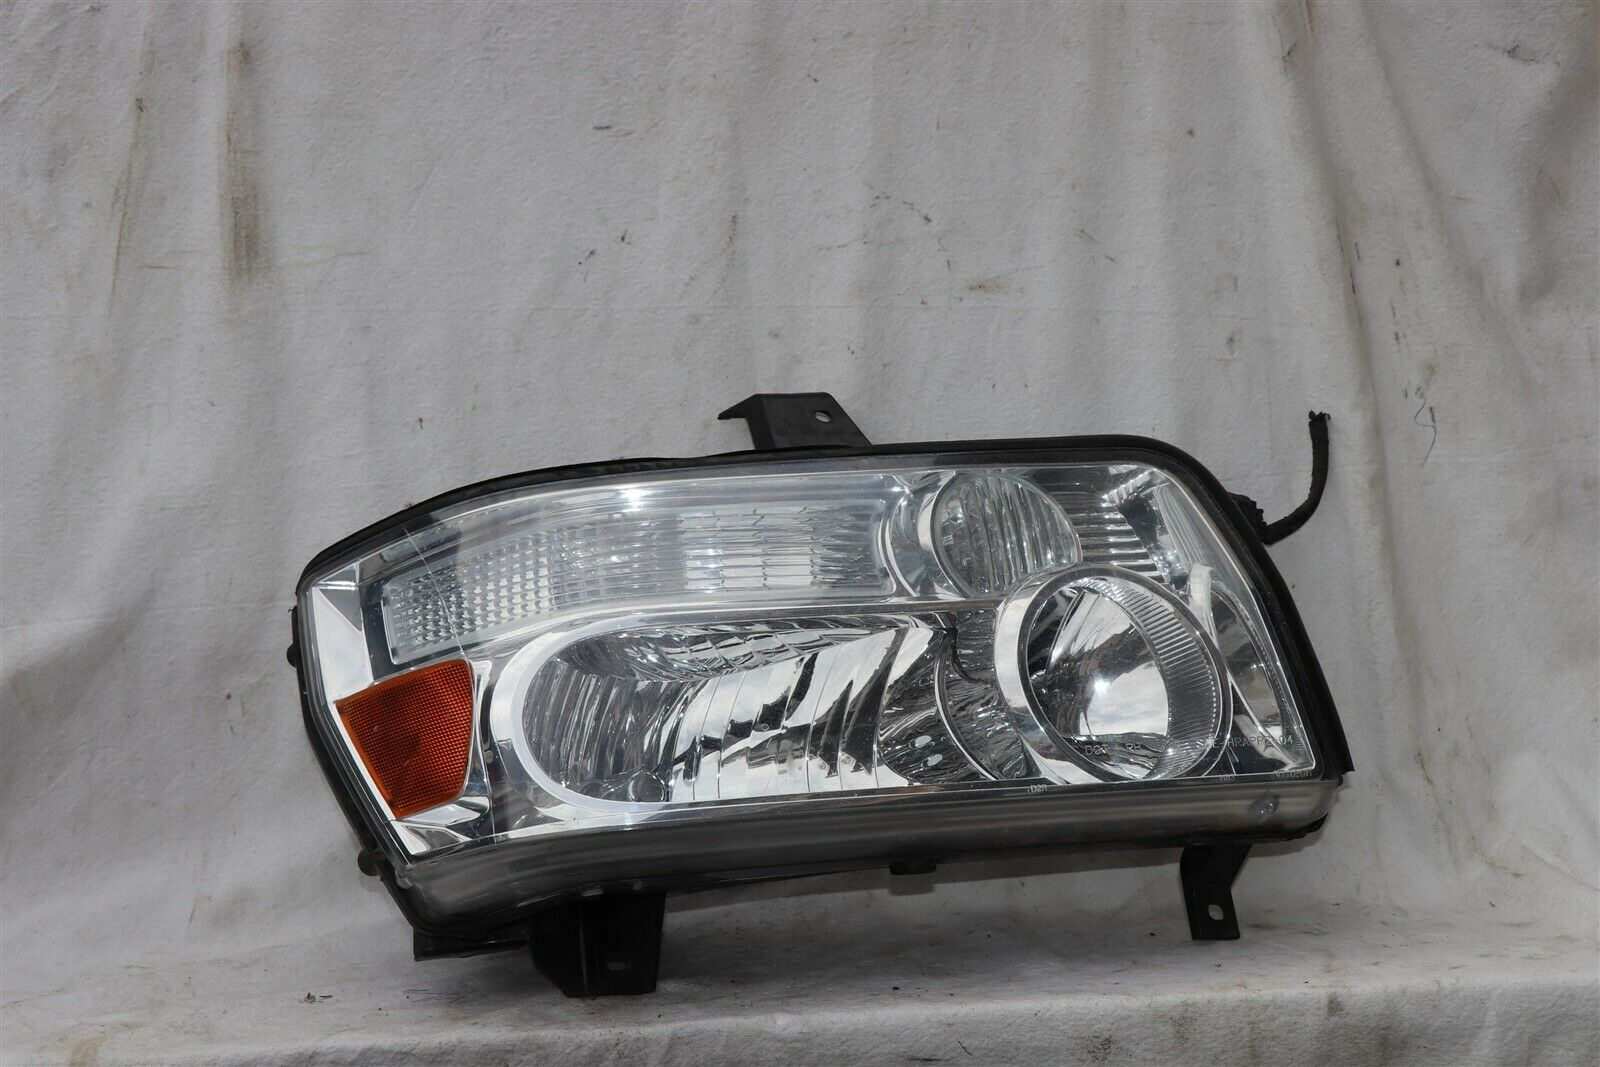 04-10 Infiniti QX56 Xenon HID Headlight Head Light Passenger RH - POLISHED